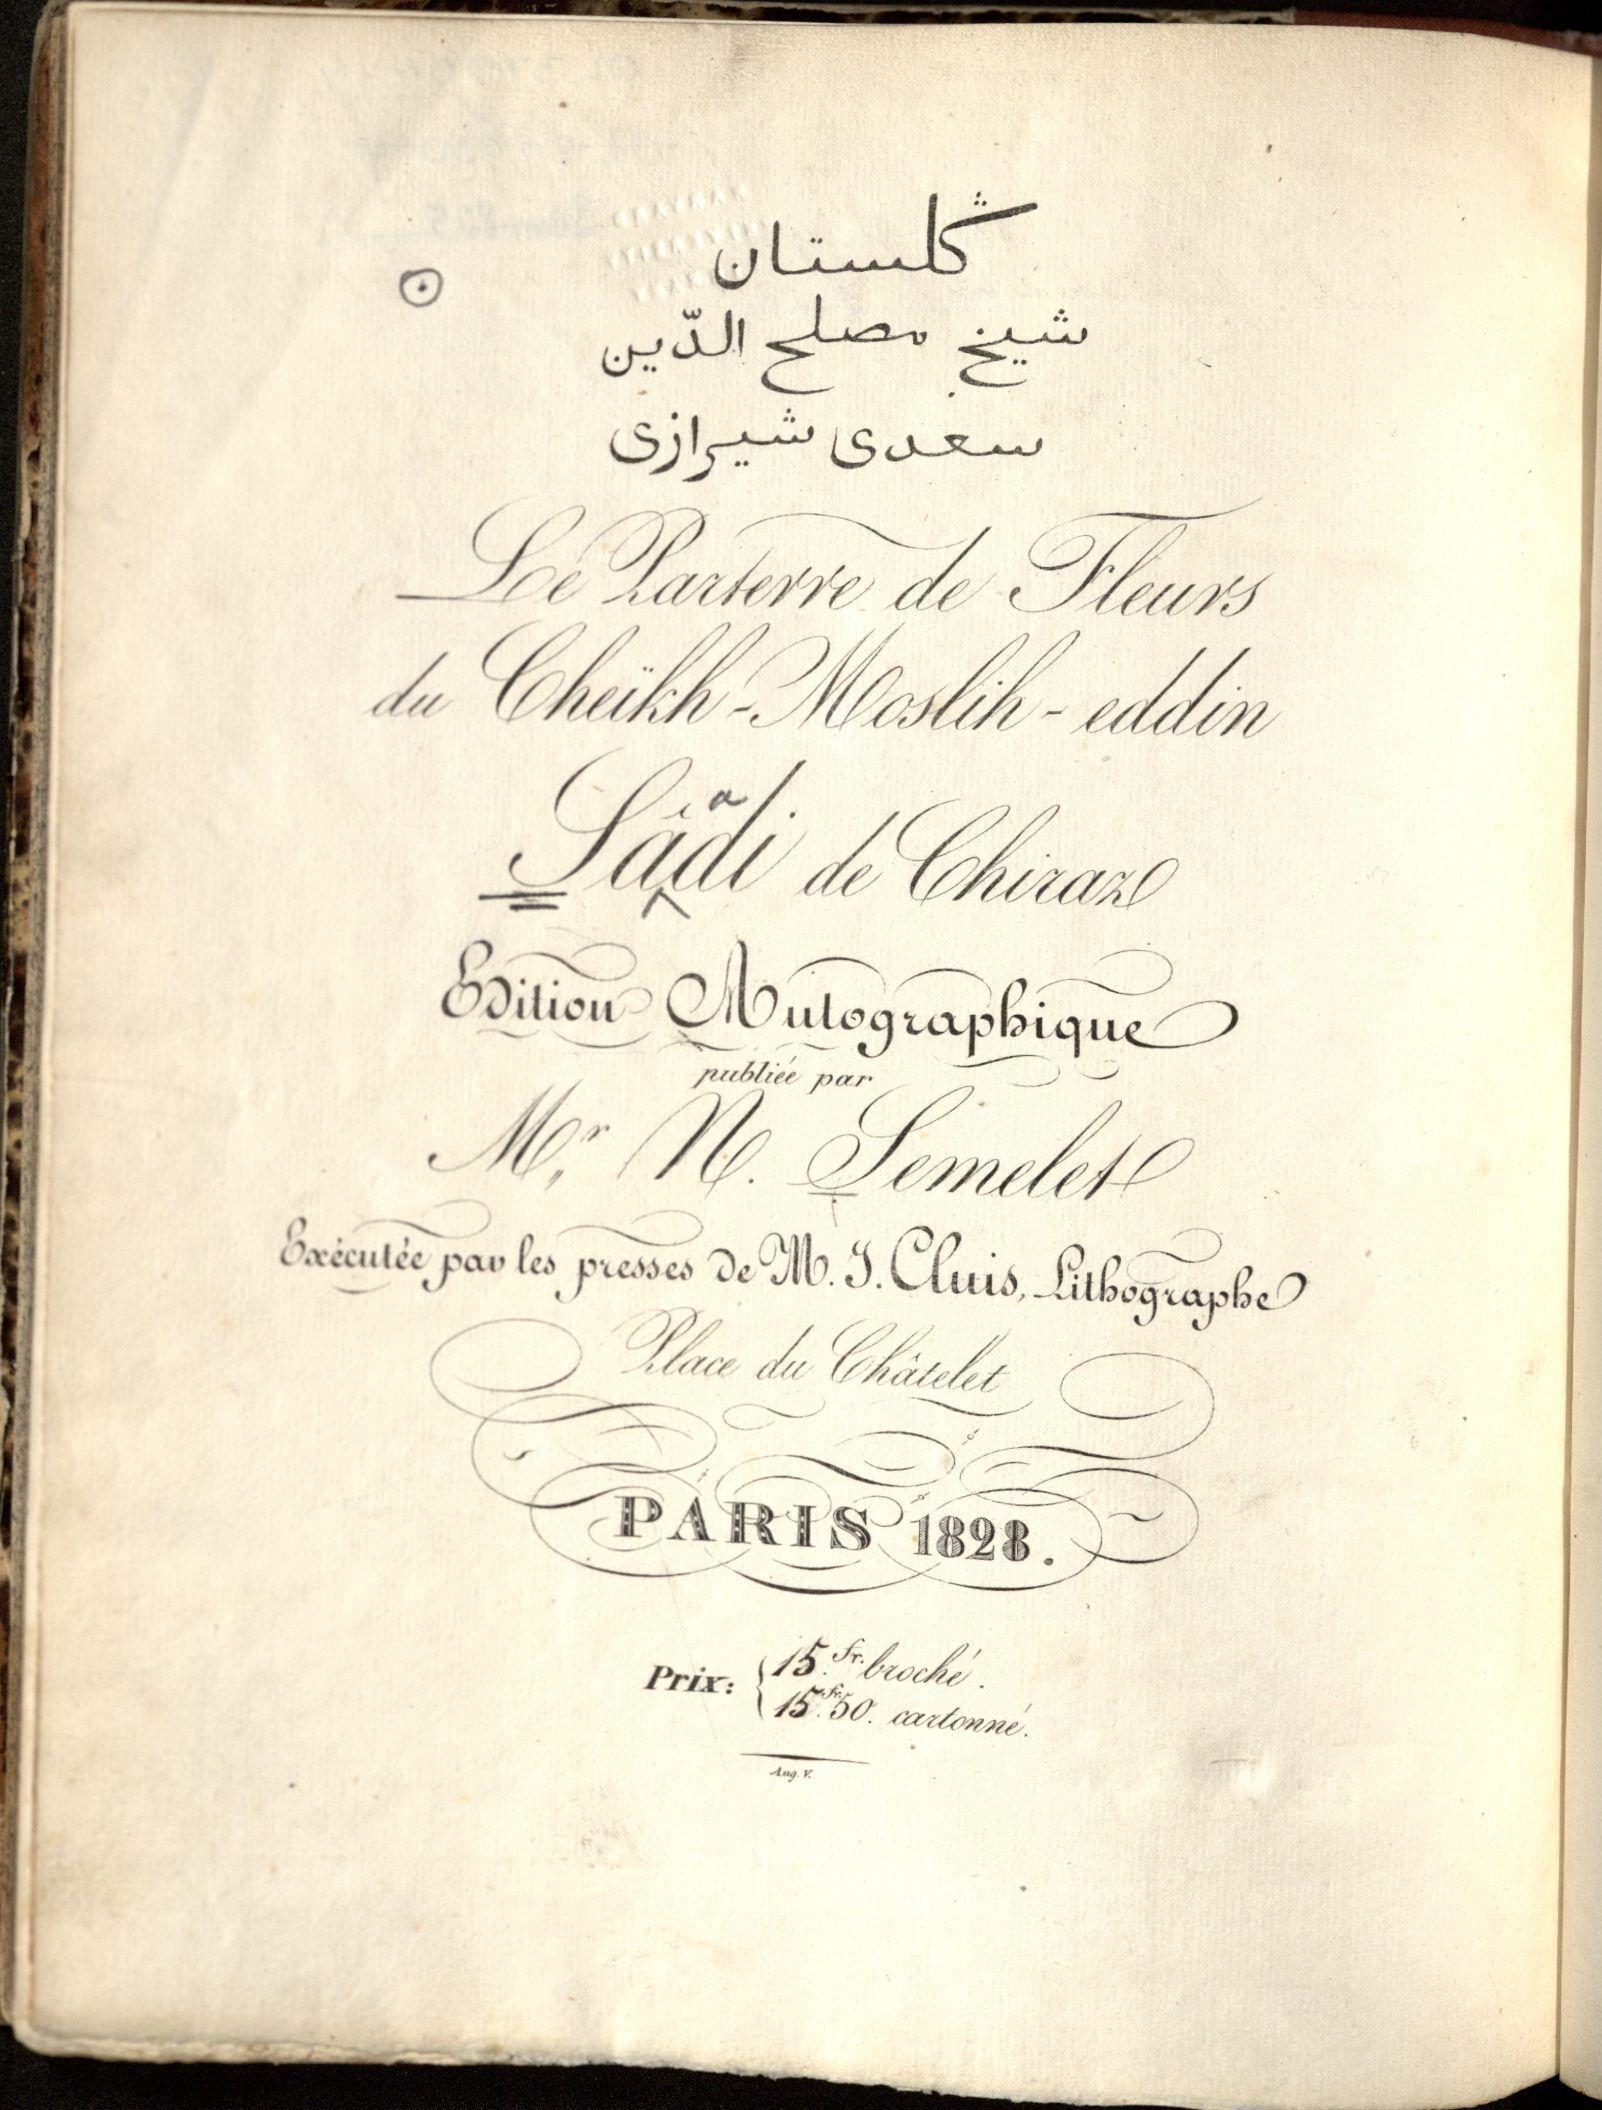 Le parterre de fleurs du Cheikh Moslih-eddin Saadi de Chiraz (title page). OL 37904.4, Widener Library, Harvard University